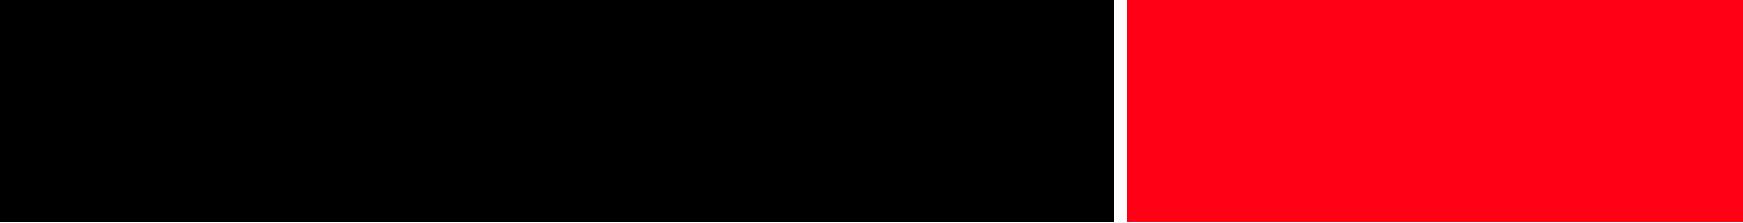 Venture-Beat_logo.png